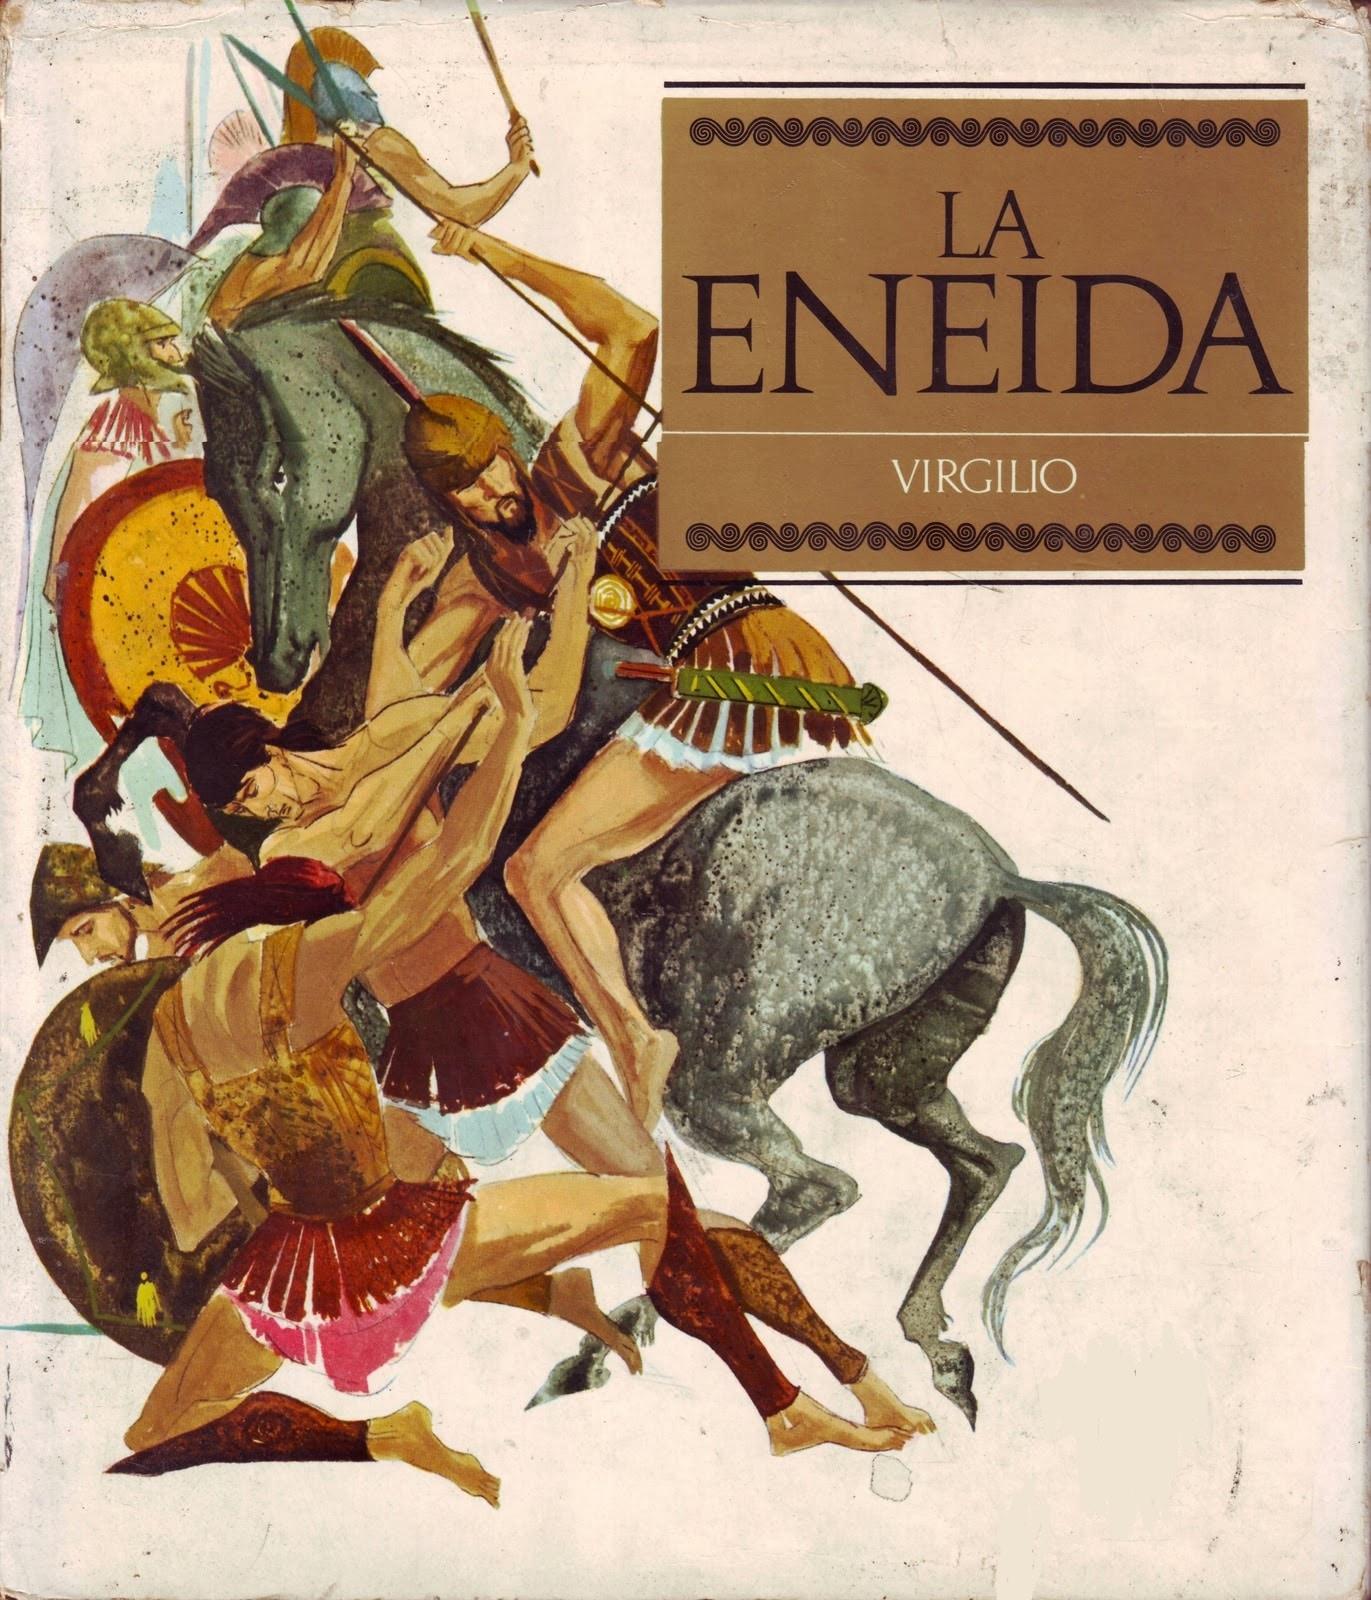 eneida-1